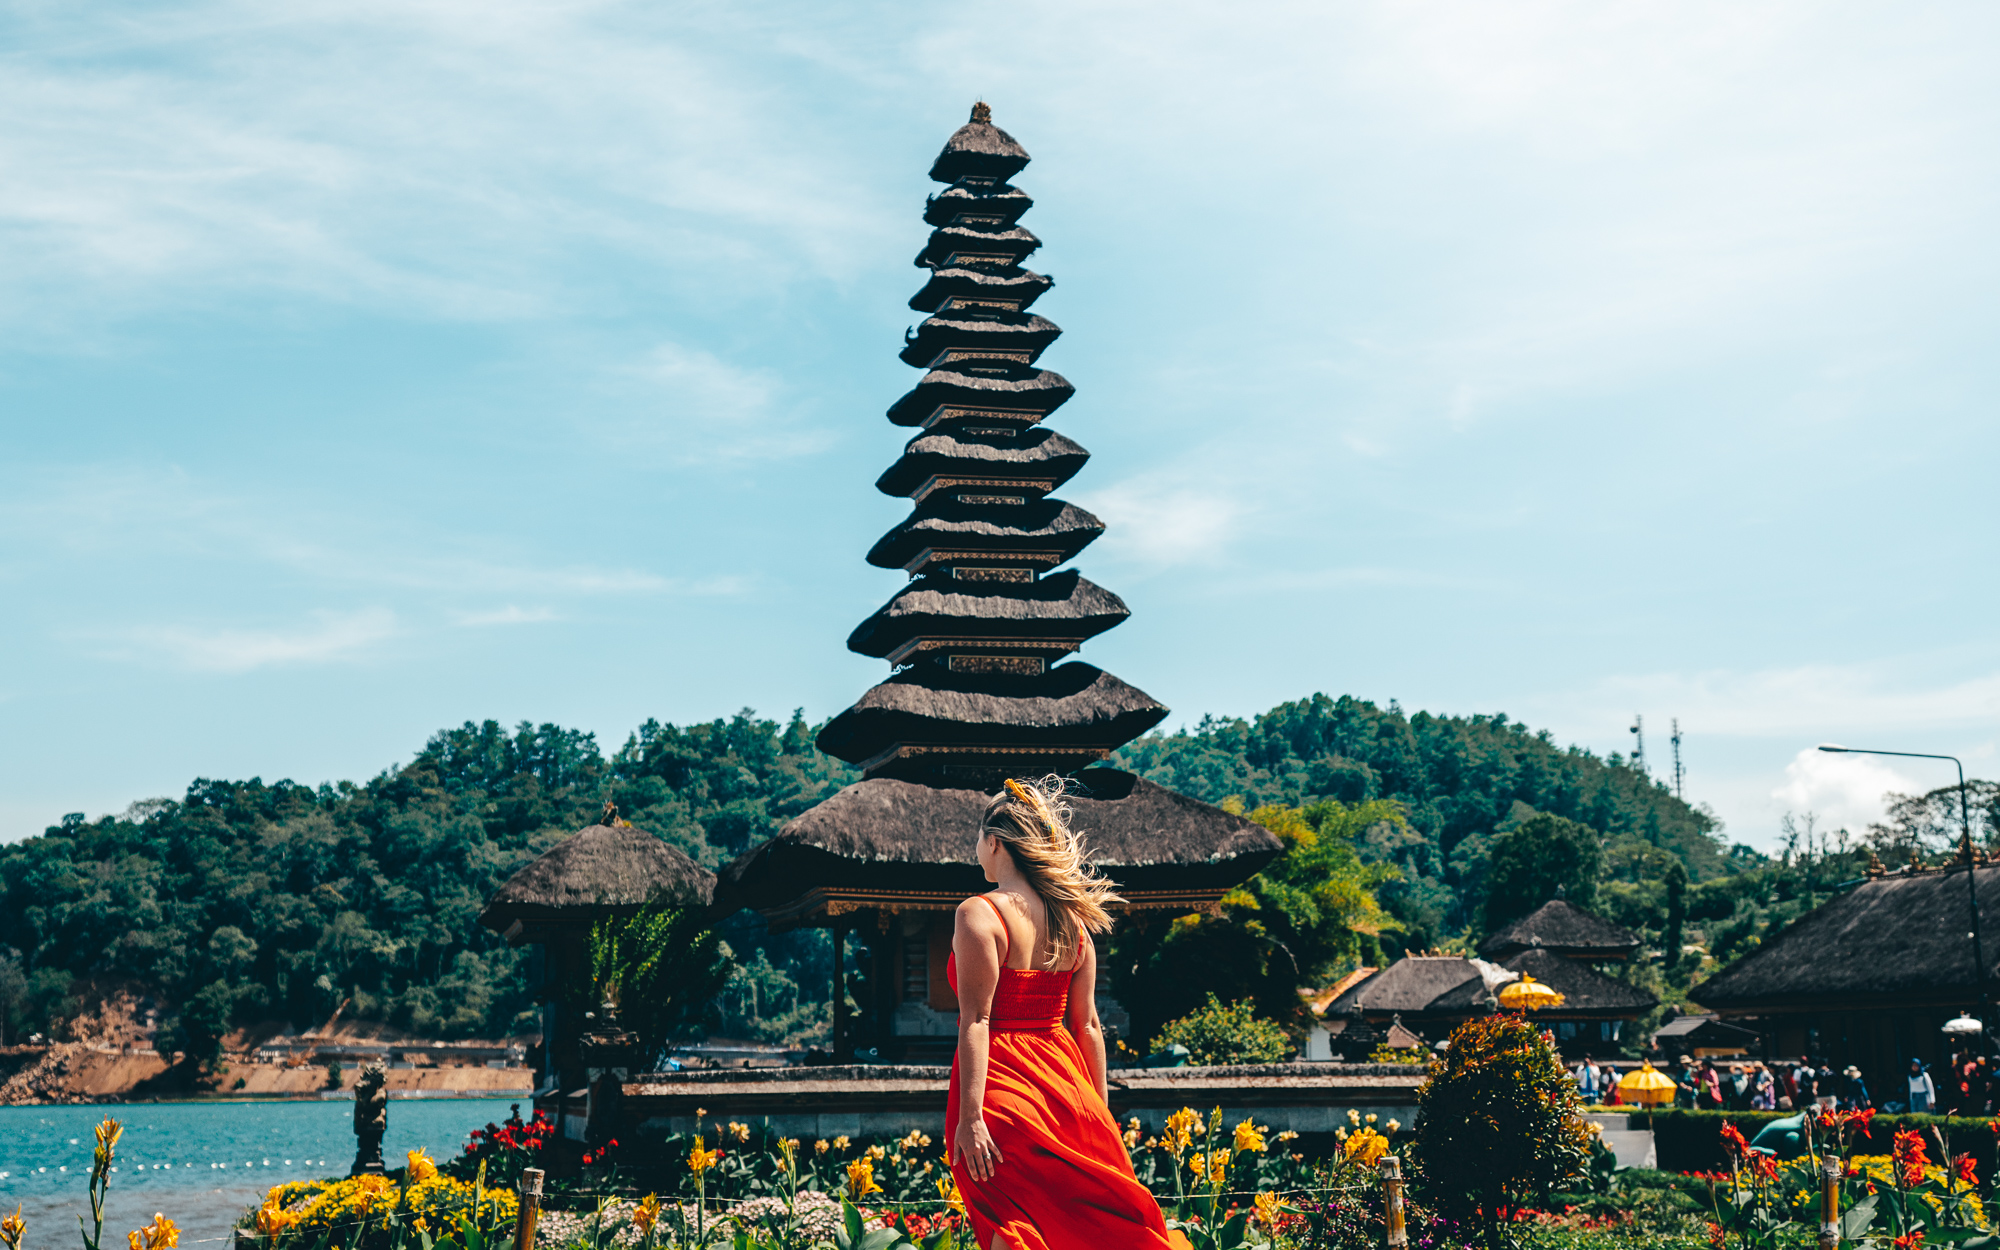 Ulun Danu Bratan Temple Bali 2019 Tips For Visiting The Floating